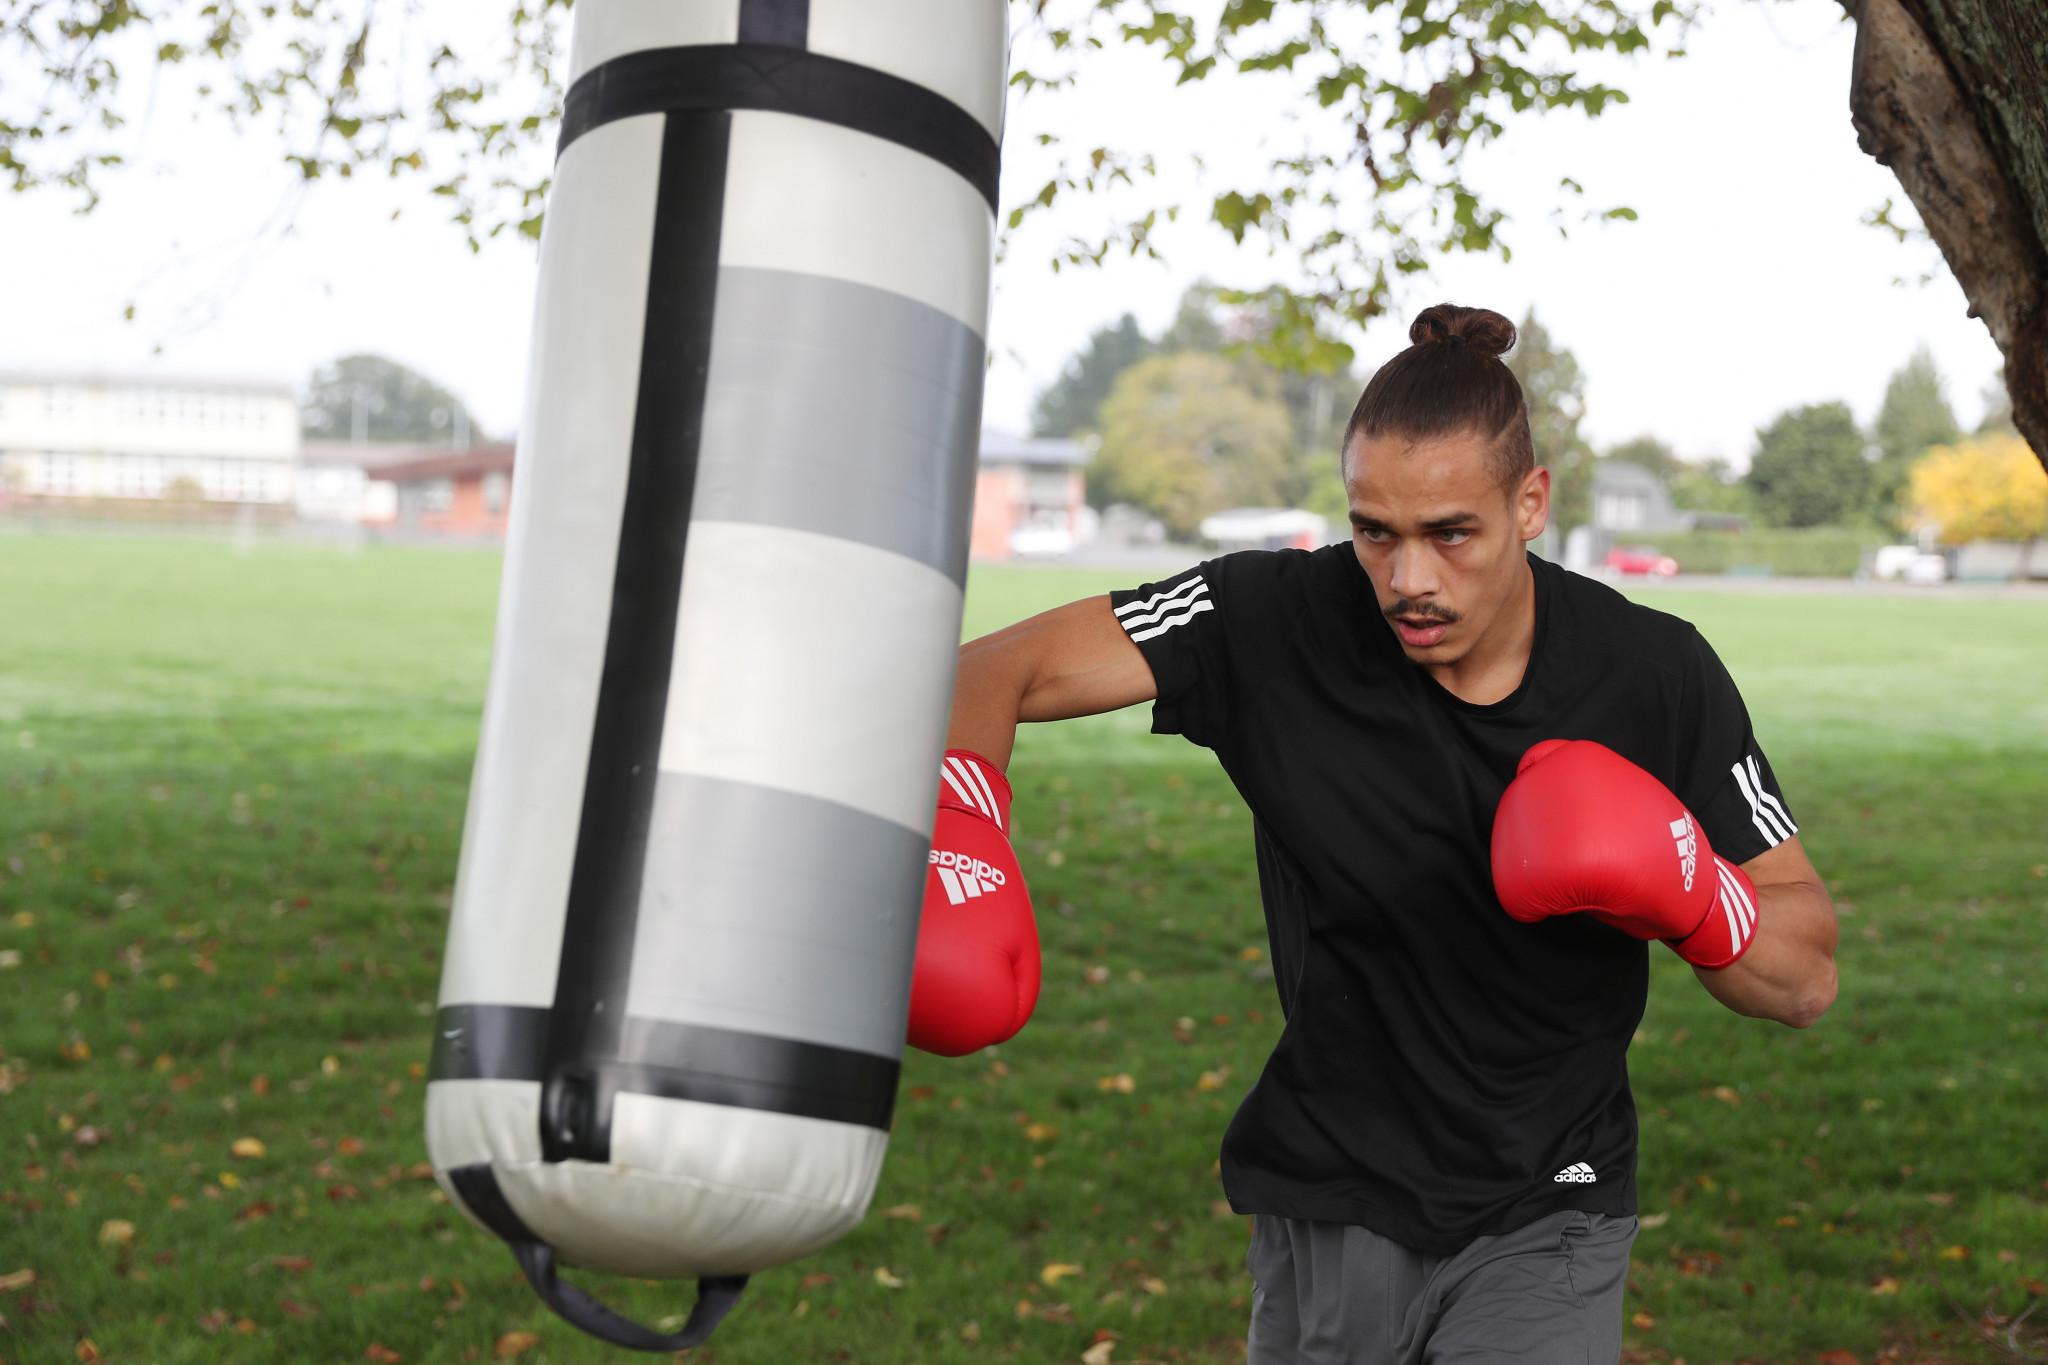 Nyika to make professional debut next month as boxer hones Tokyo 2020 preparations